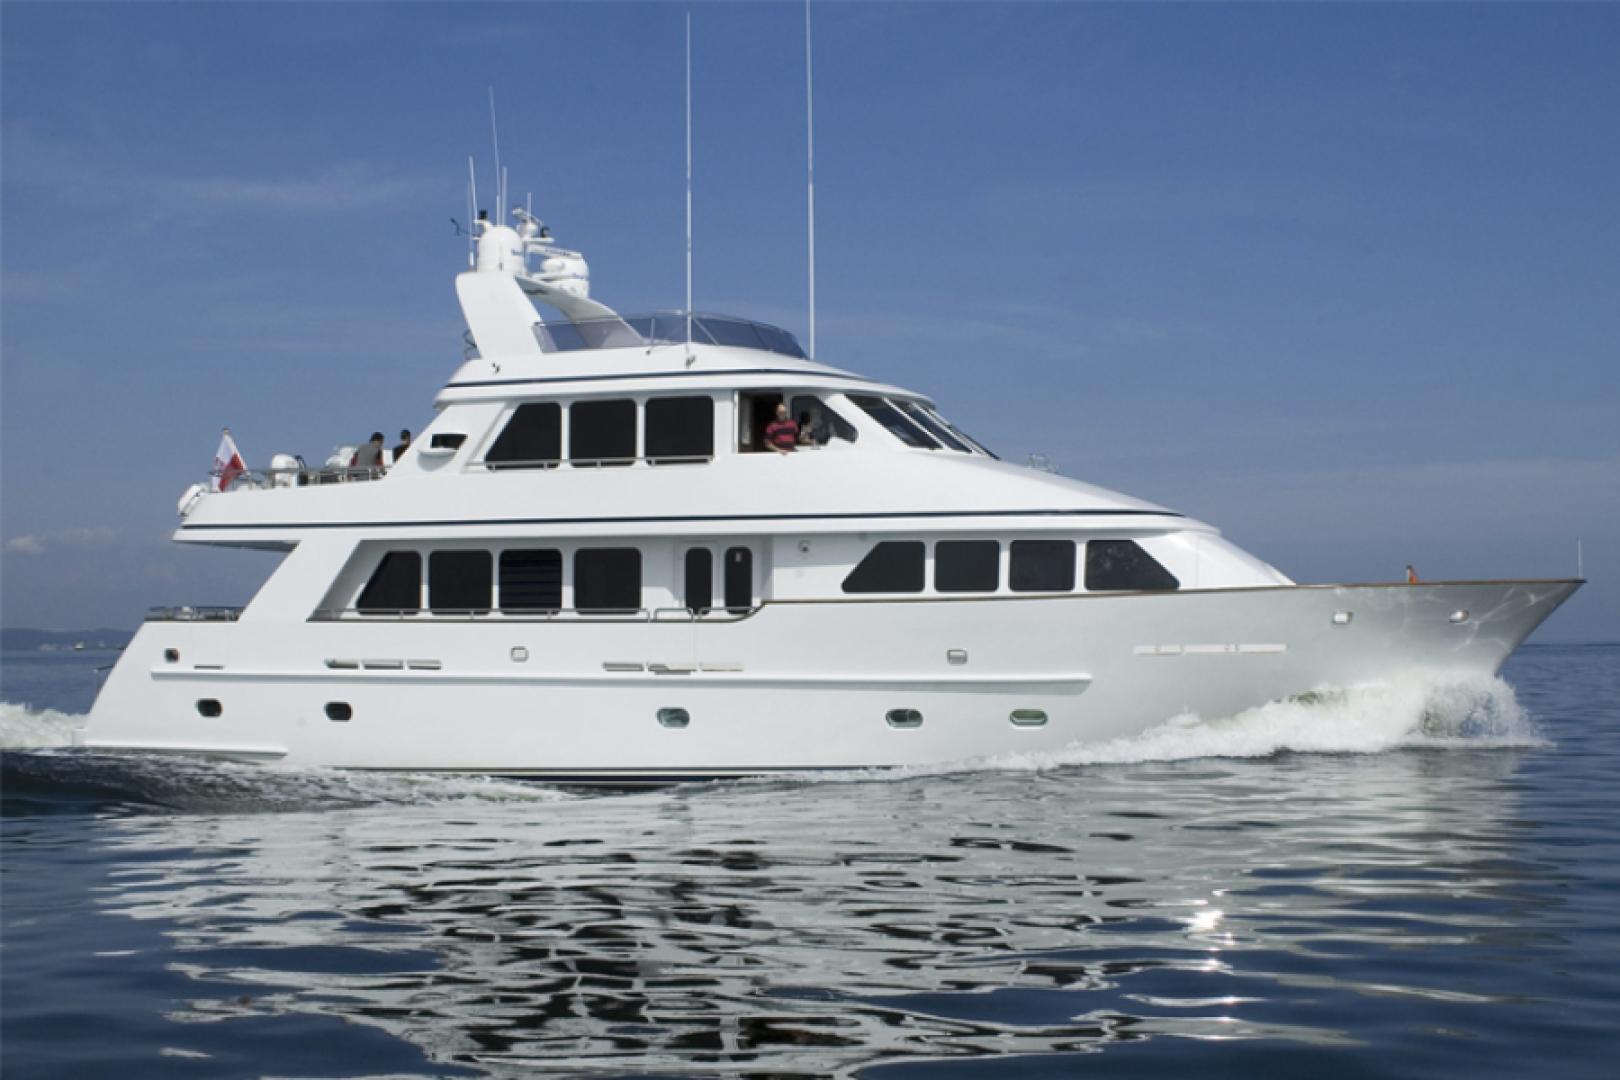 Conrad Shipyard-88 Motor Yacht 2005-Chillin Fort Lauderdale-Florida-United States-Conrad Motor Yacht 2005 Chillin-1537331 | Thumbnail